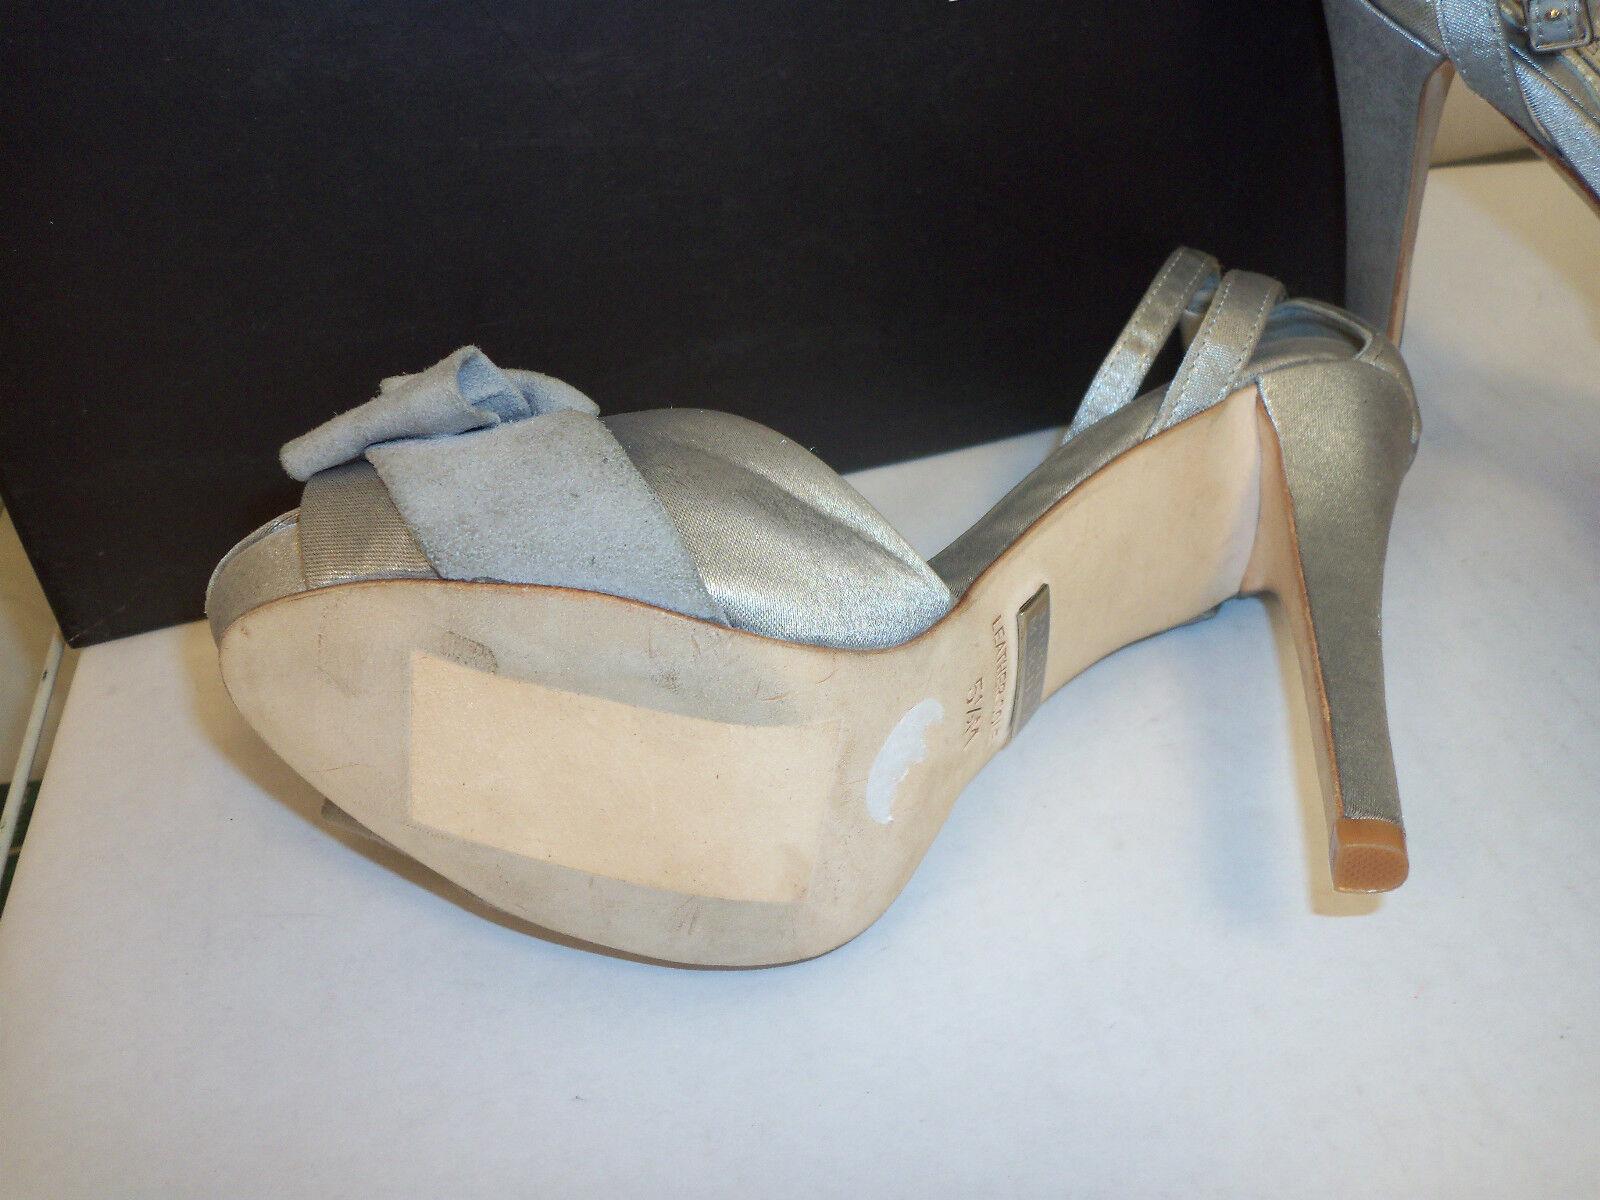 Badgley Mischka New Damenschuhe Baby Silver Toe Satin 5.5 M Open Toe Silver Ankle Strap Heels Sh 443288